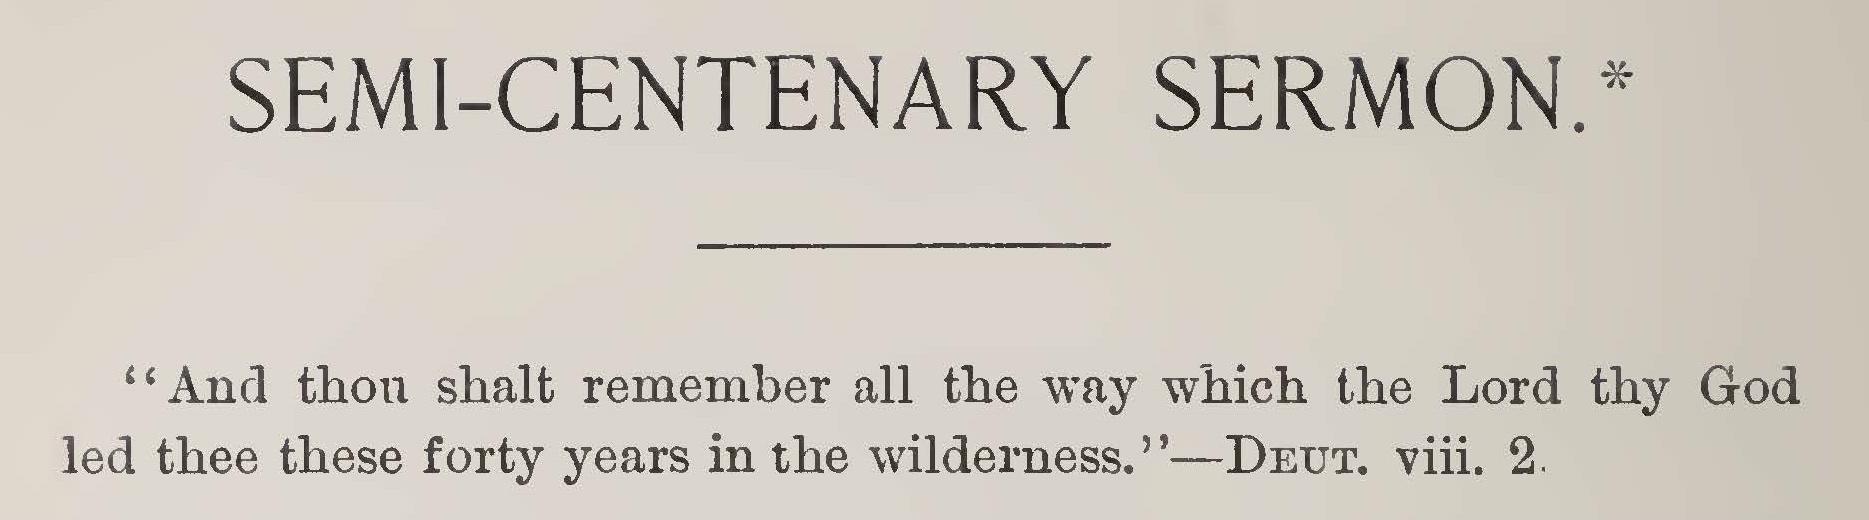 McElhenney, John, Semi-Centenary Sermon Title Page.jpg